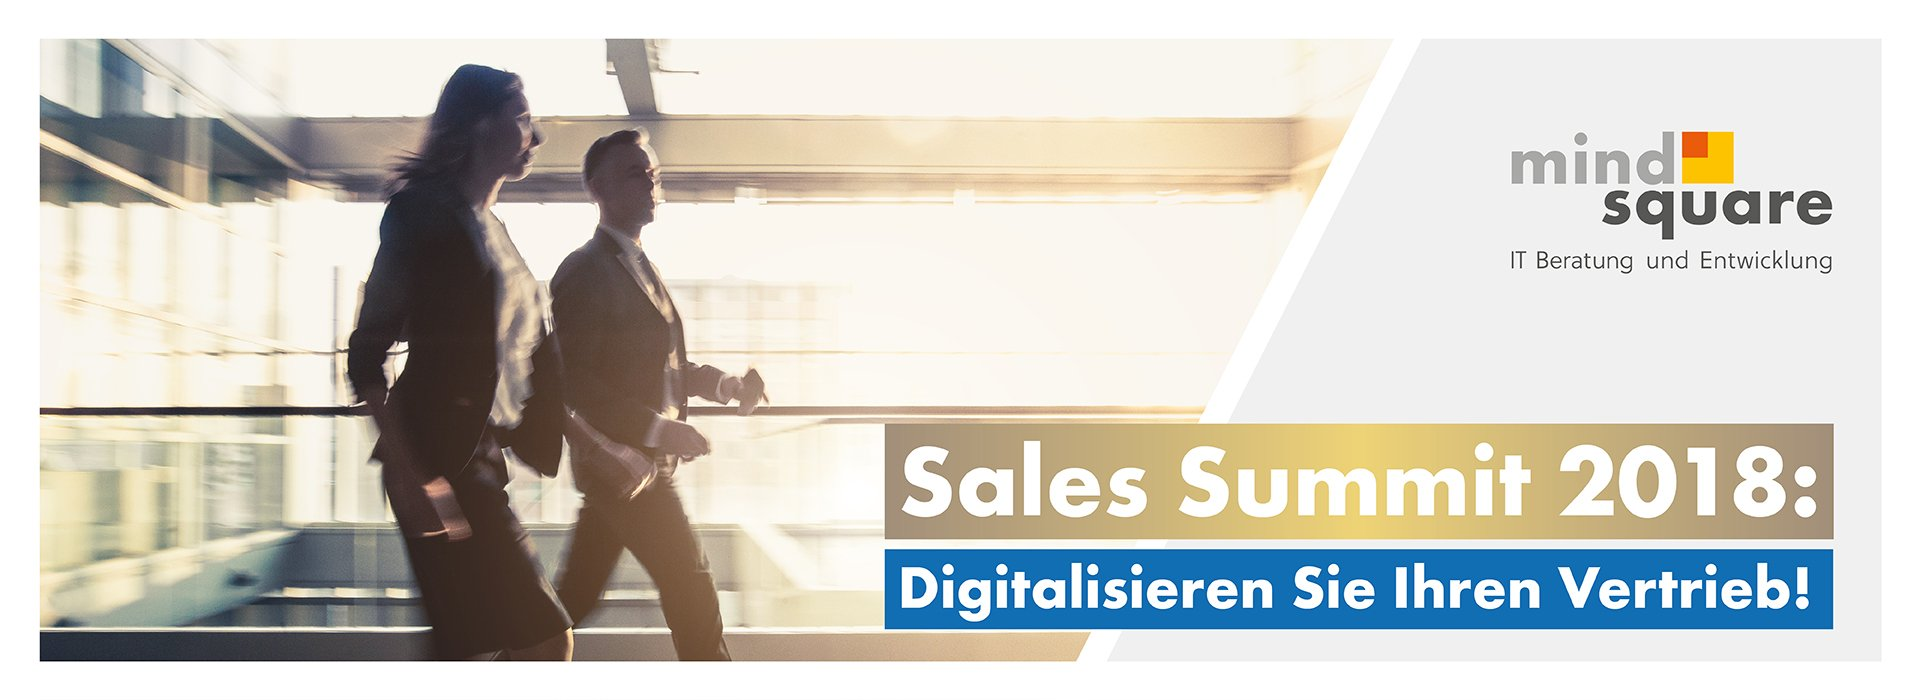 Sales Summit 2018